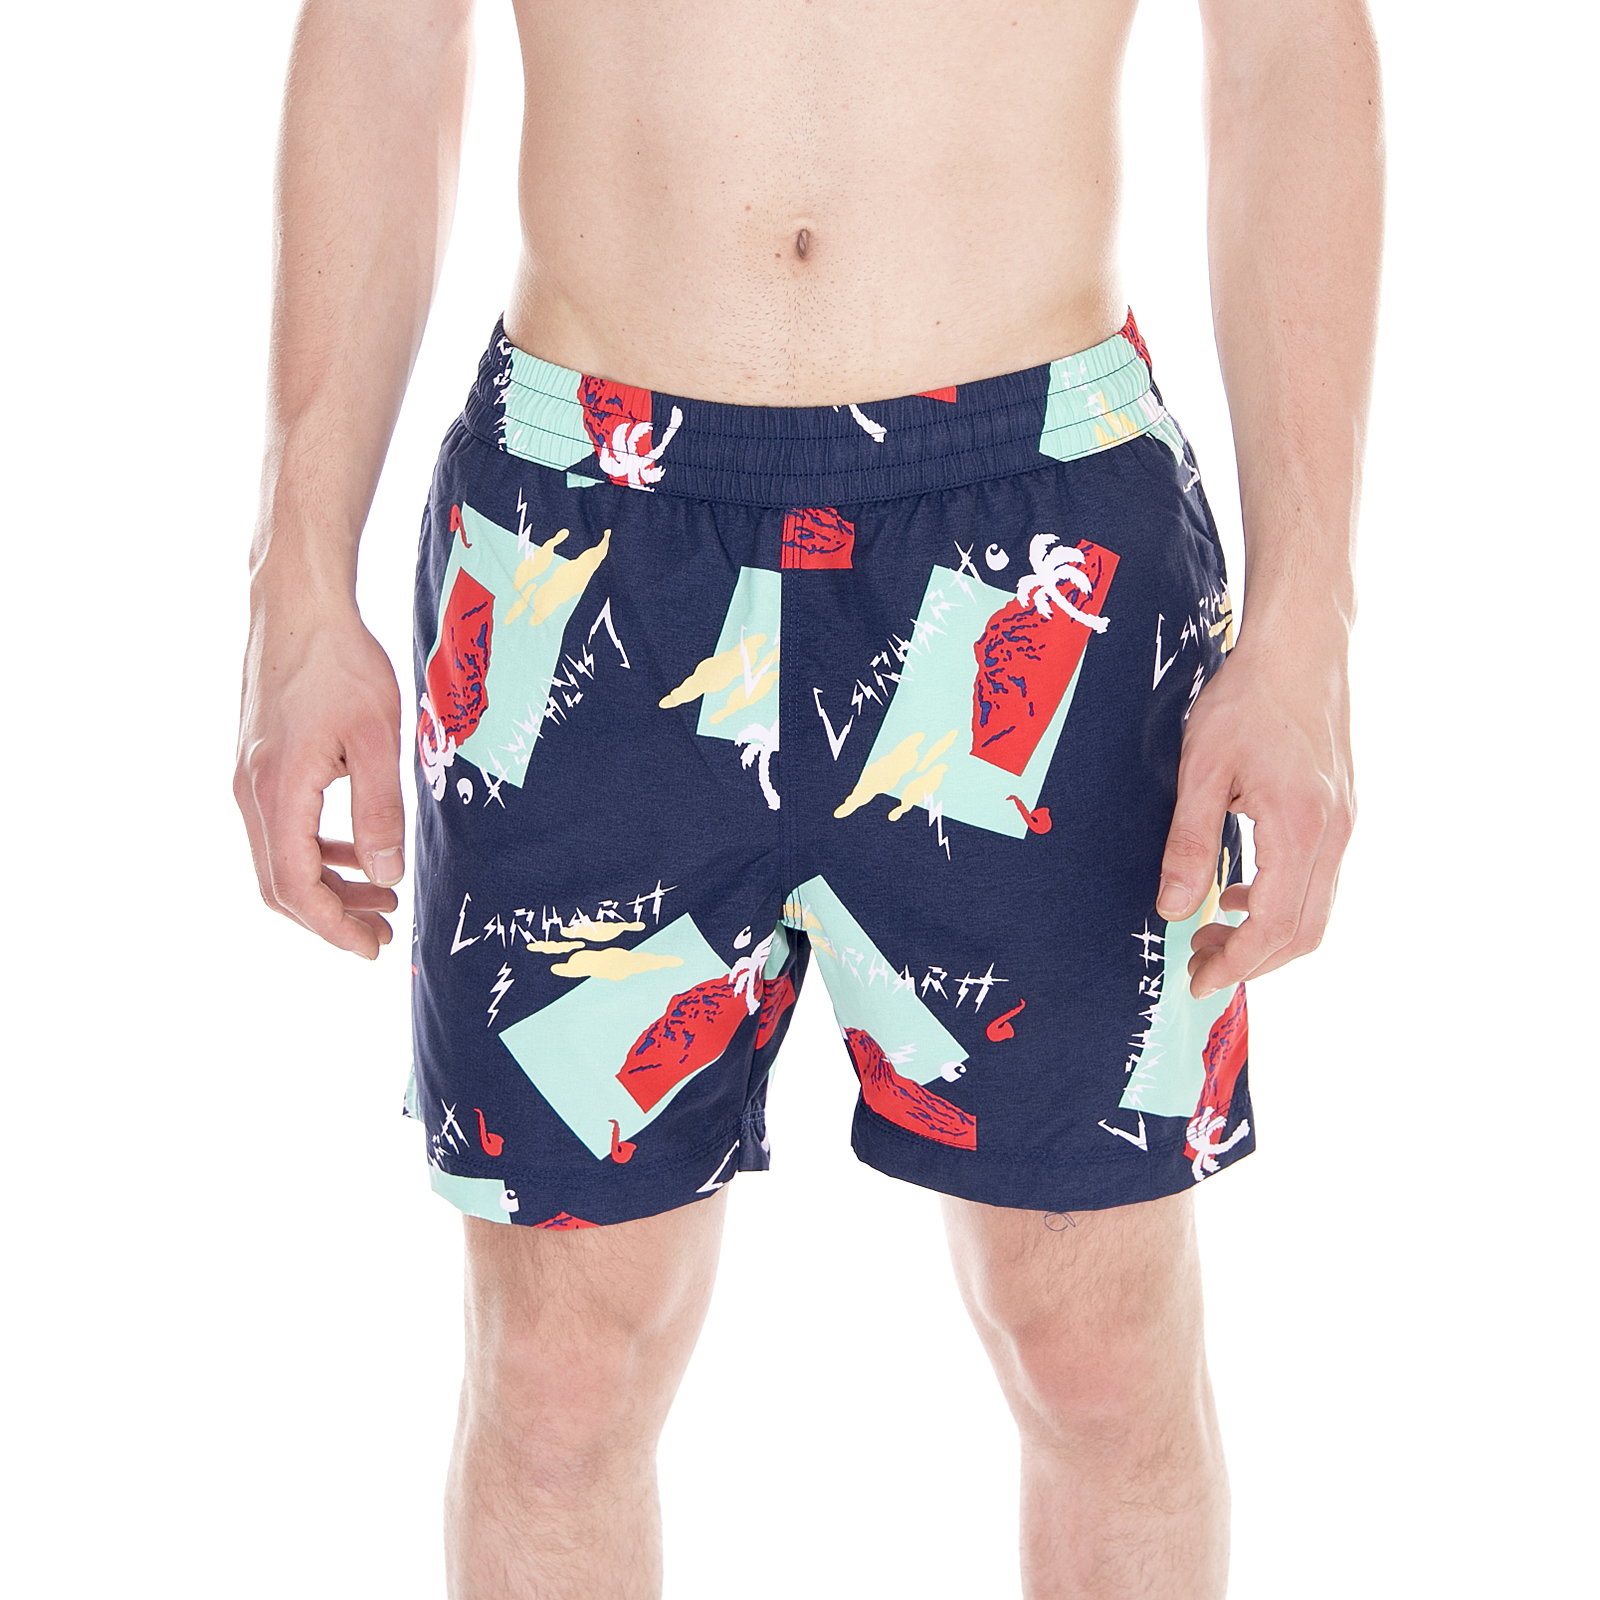 6d21ba7895 Carhartt Beachwear Drift Swim Trunk Anderson Print, Sub Blue Multicolor